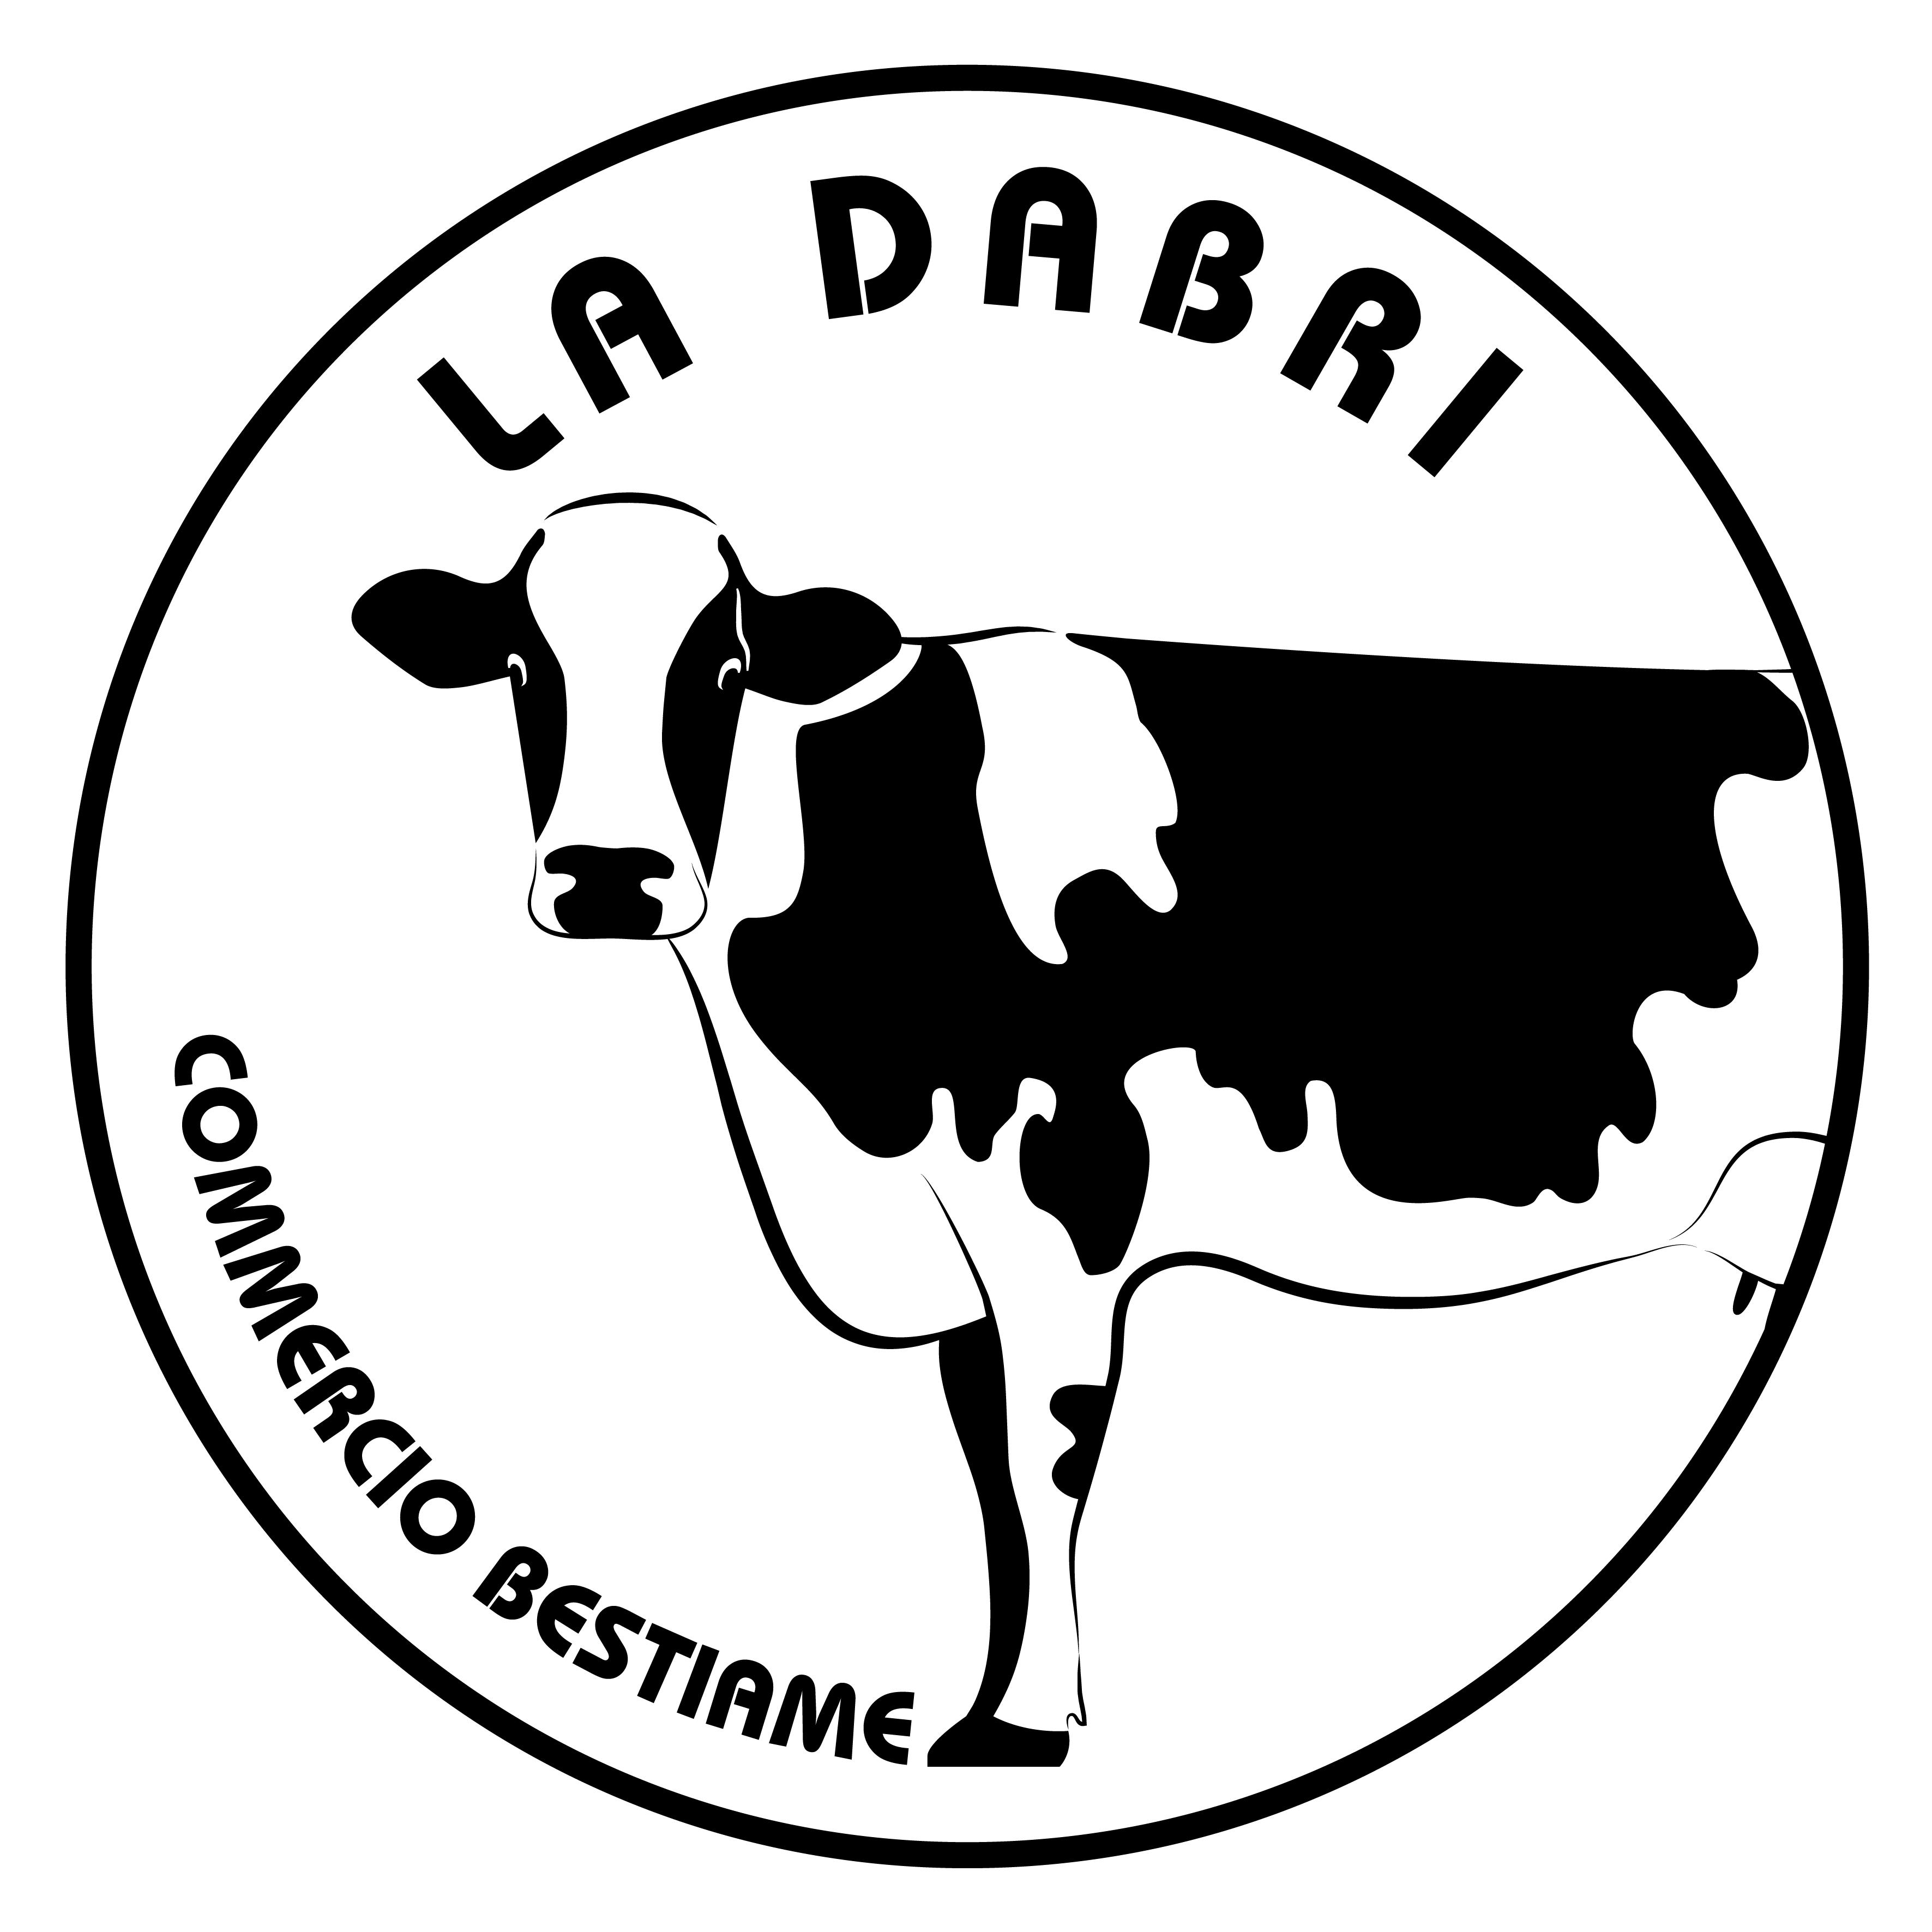 La Dabri